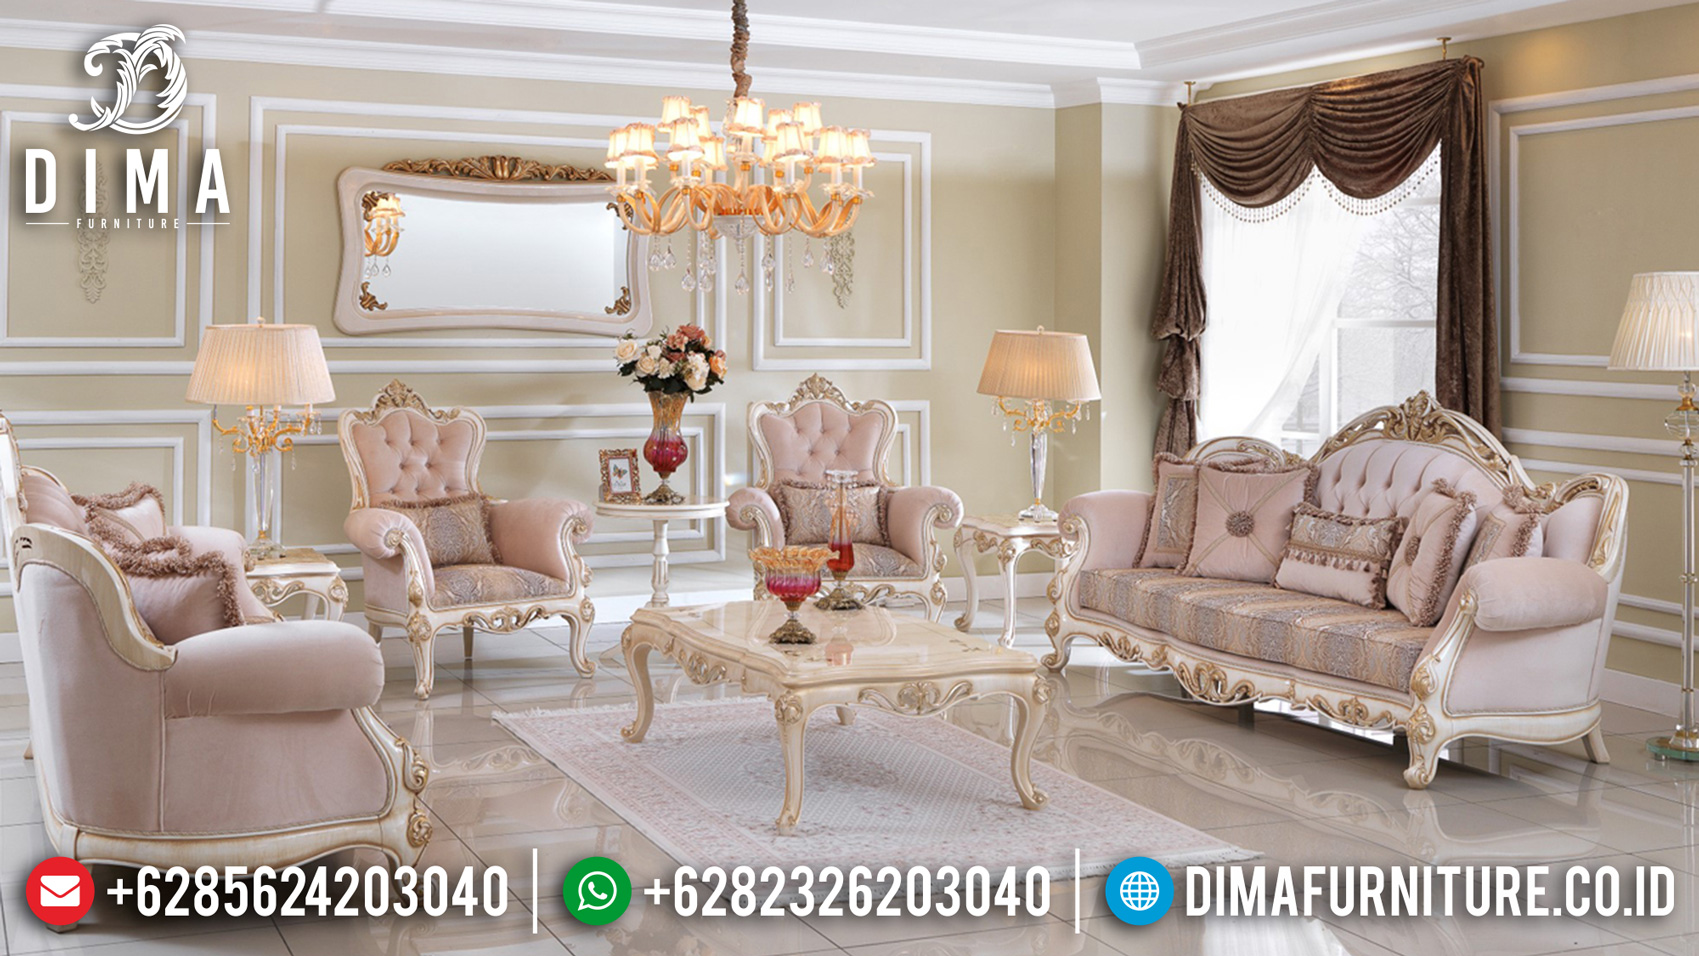 New Set Sofa Tamu Mewah Ukiran Jepara Luxurian Type Elegant Living Room TTJ-1040